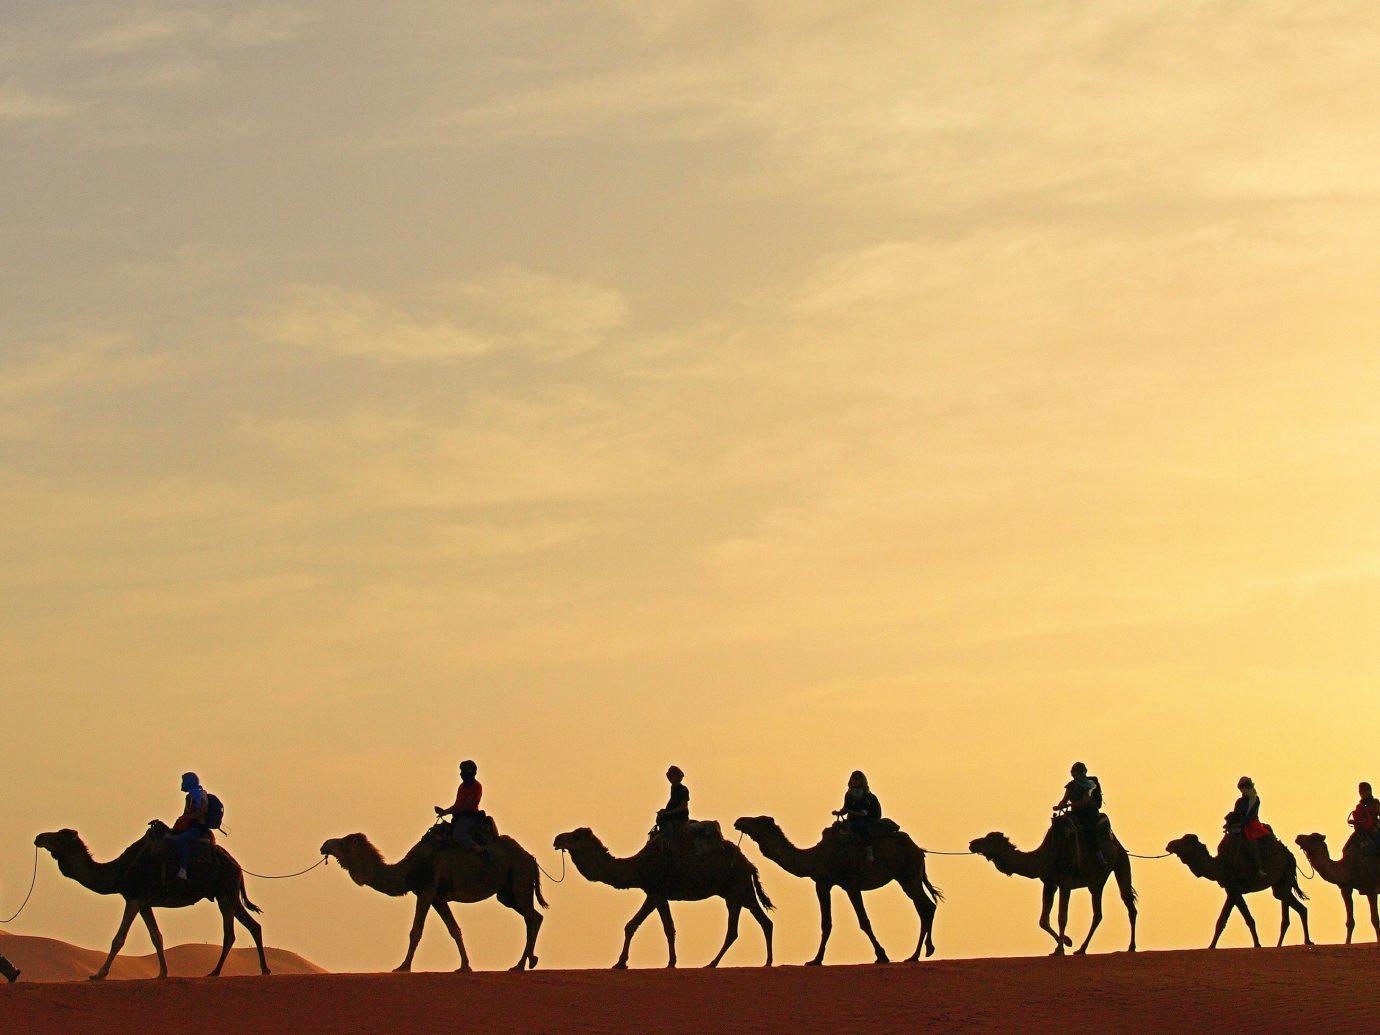 Hotels outdoor Camel natural environment people group Desert sahara camel like mammal landscape plain mustang horse steppe aeolian landform savanna prairie camel racing line horse